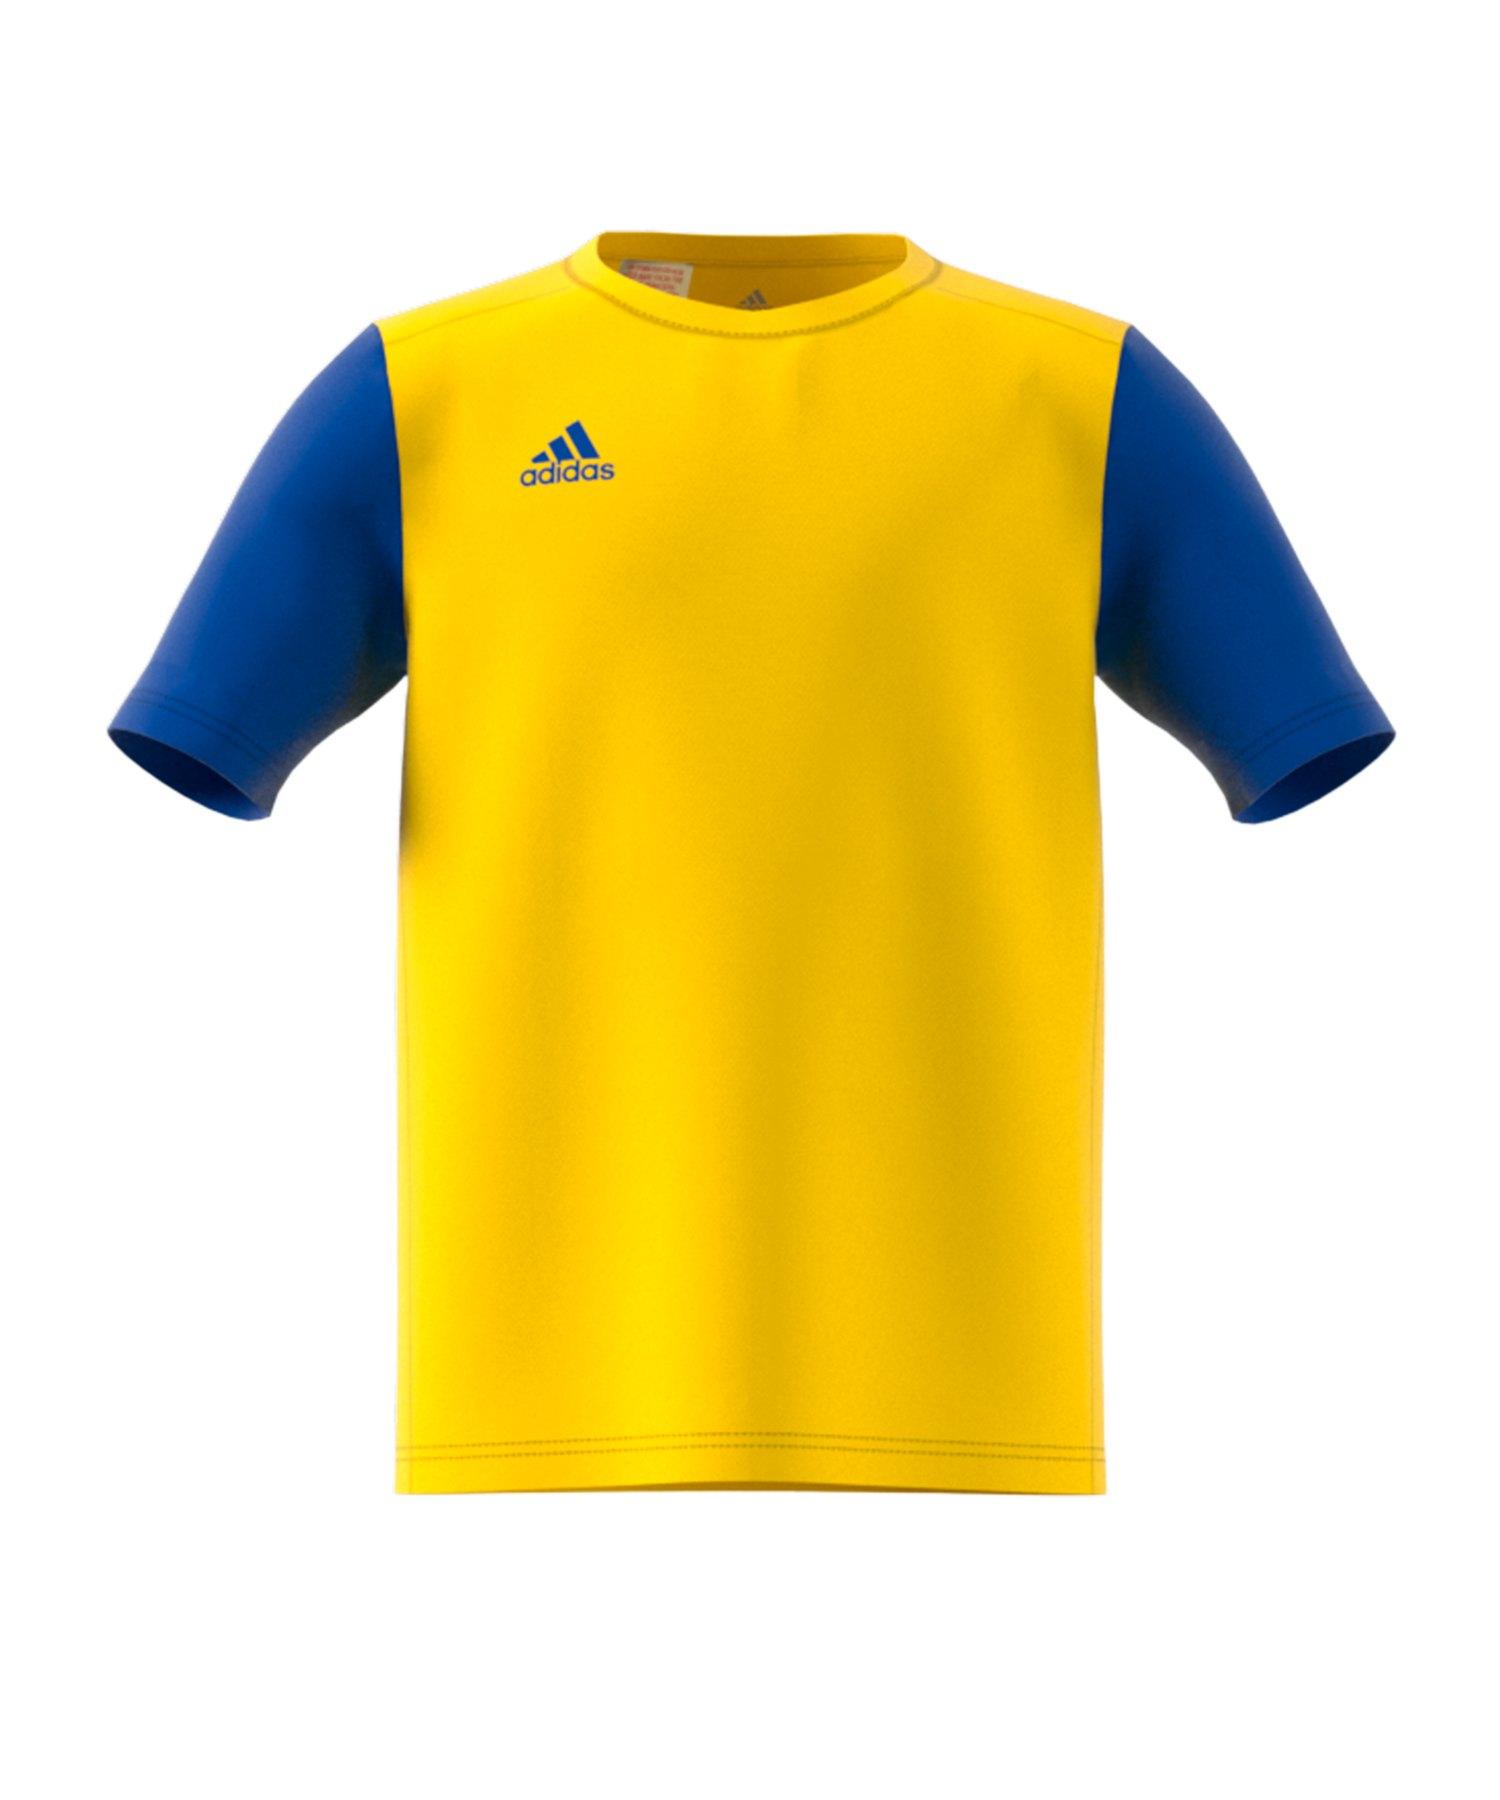 adidas Estro 19 Trikot kurzarm Kids Gelb Blau - gelb